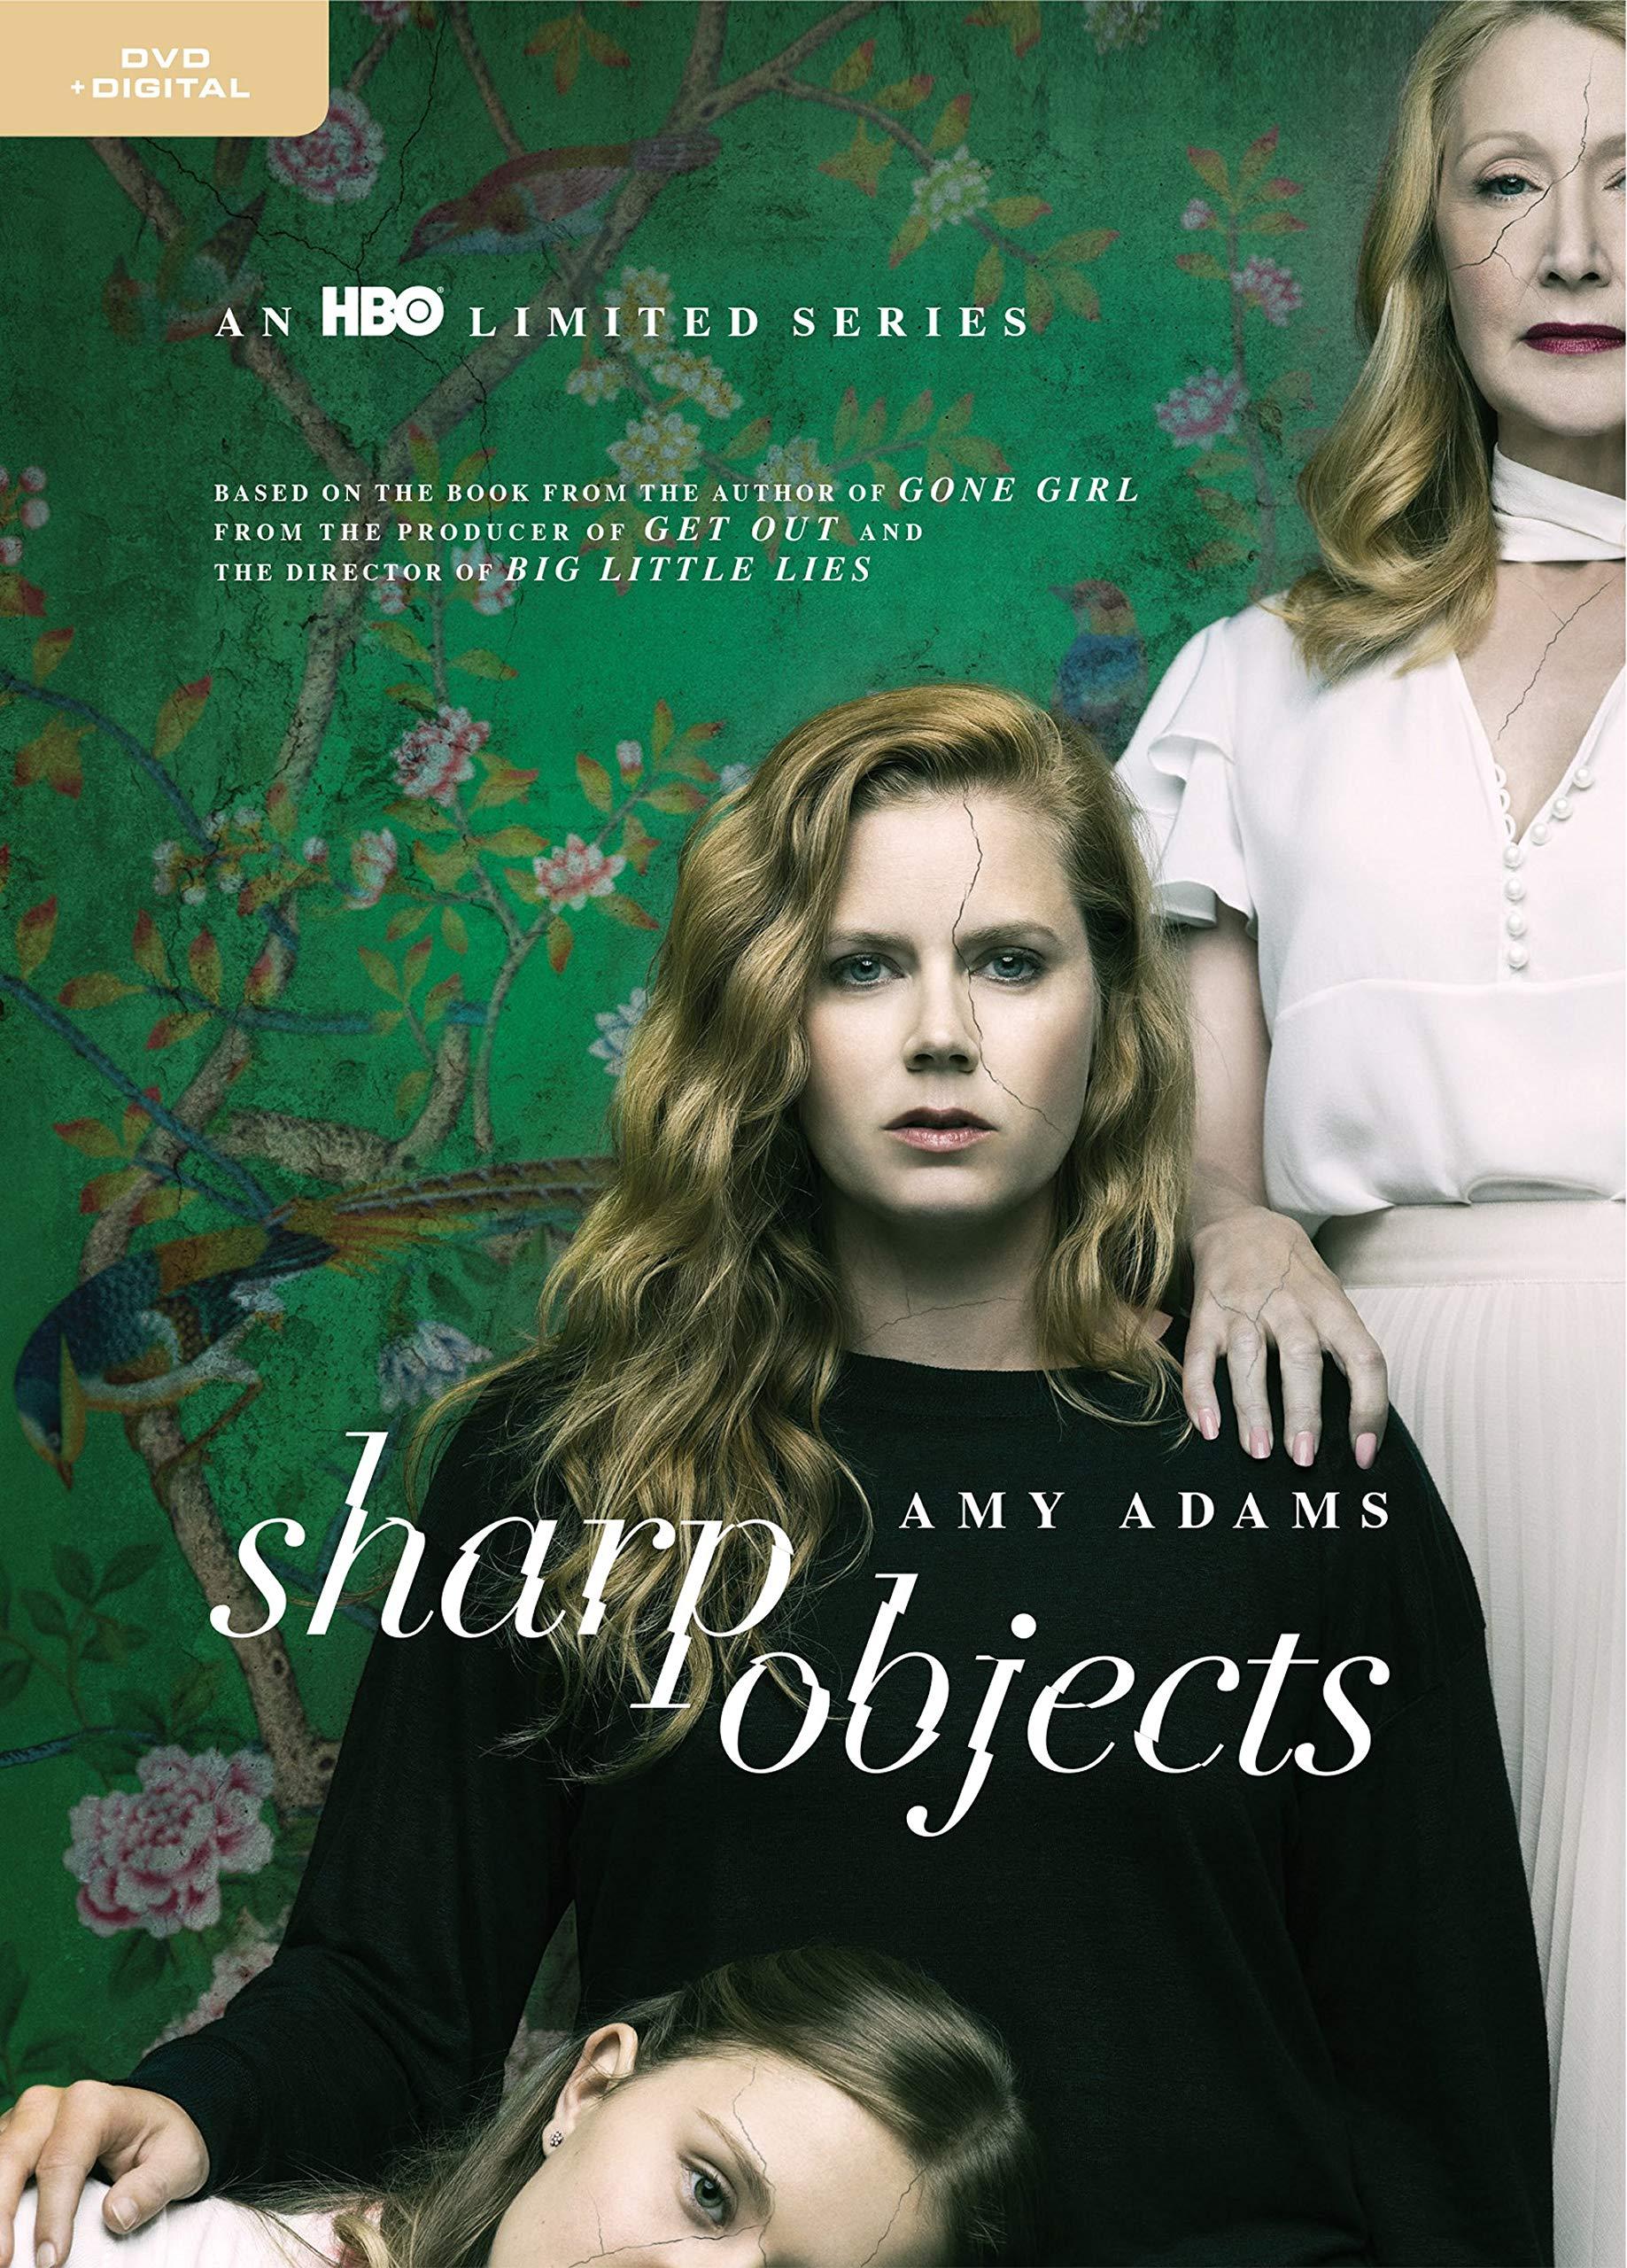 DVD : Sharp Objects (Standard Edition, Ultraviolet Digital Copy, Eco Amaray Case, Digital Copy, 2 Pack)